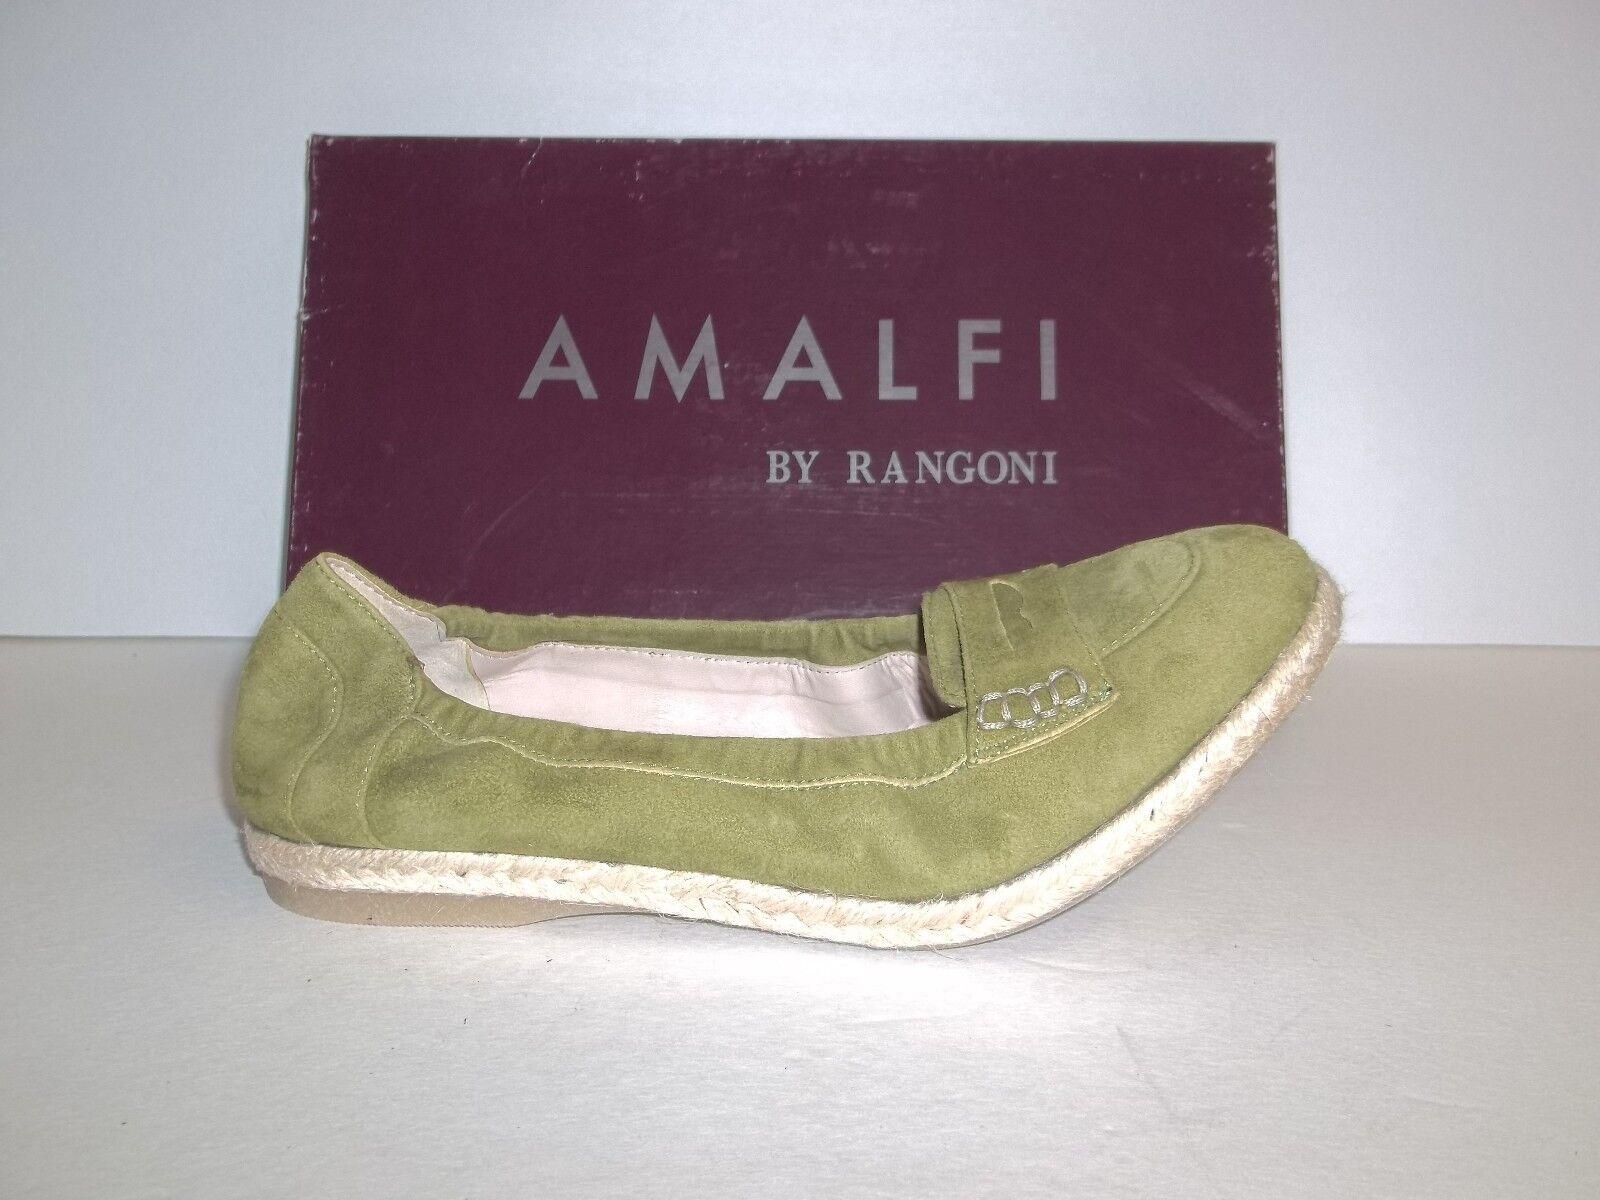 Amalfi by Rangoni Größe 7.5 M Cielo Sedano Green Leder Flats NEU Damenschuhe Schuhes